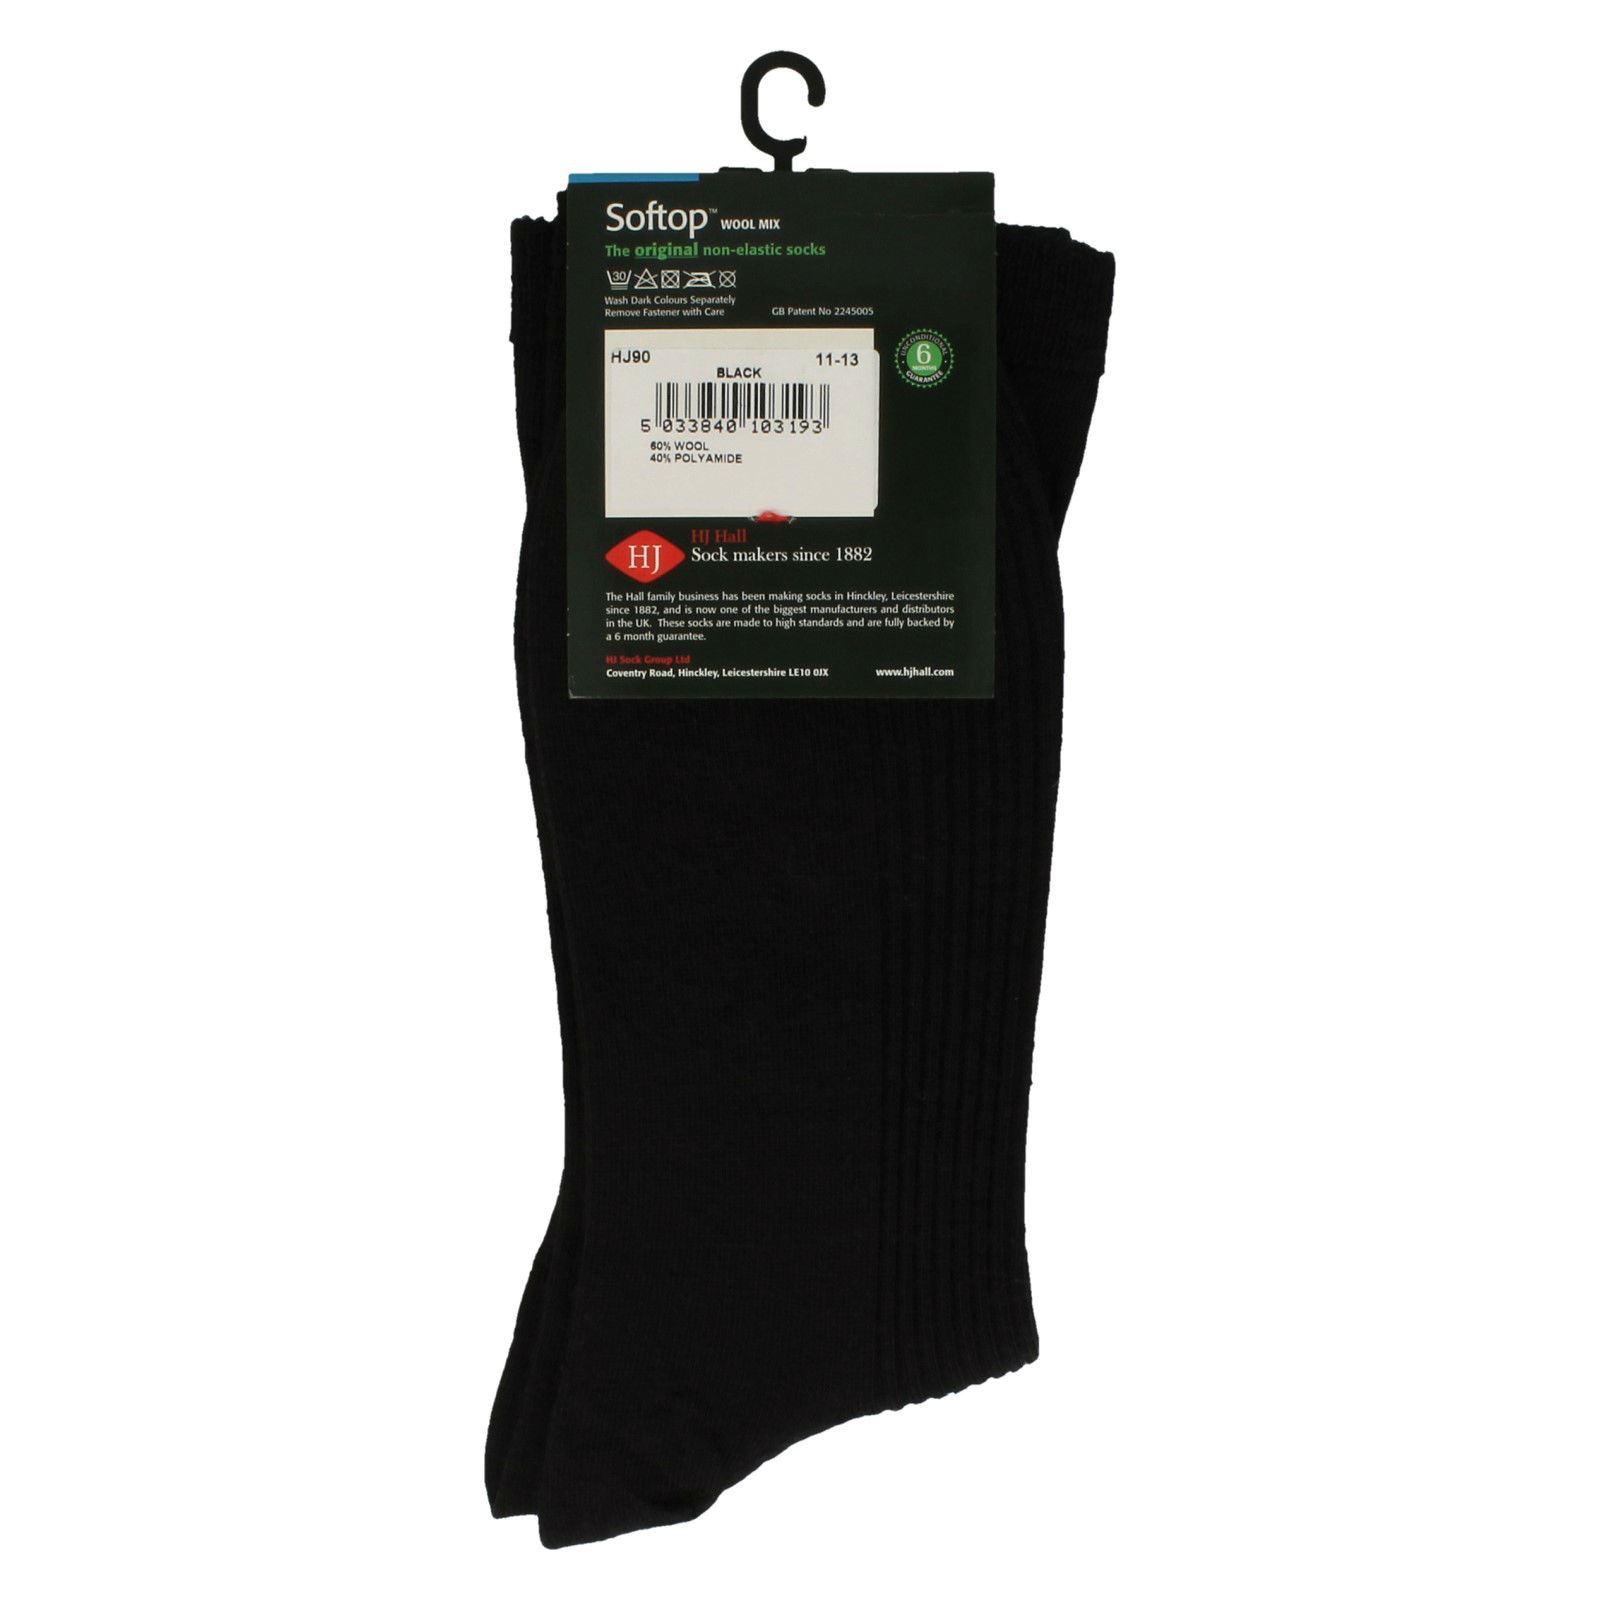 Mens HJ Merino Wool Socks Softop HJ 90